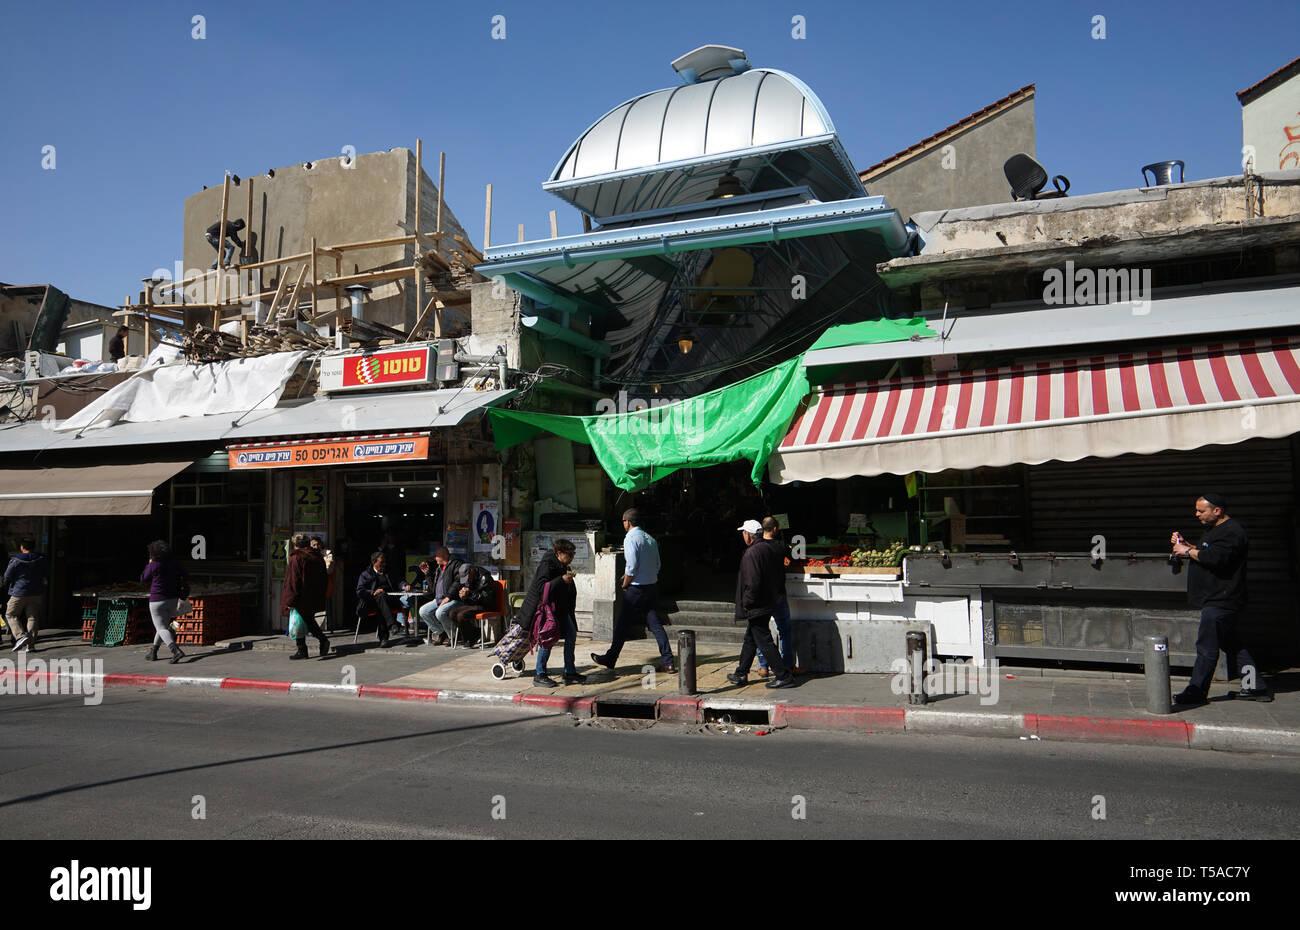 ISRAEL - JERUSALEM MARKET MAHANE YEHUDA  - SHUK BEIT YA'AKOV MARKET PLACE - JERUSALEM RESTAURANTS BARS FOOD SHOPS IN THE DAILY COVERED MARKET - JERUSALEM TOURISM - COLOR PHOTOGRAPHY © Frédéric BEAUMONT - Stock Image